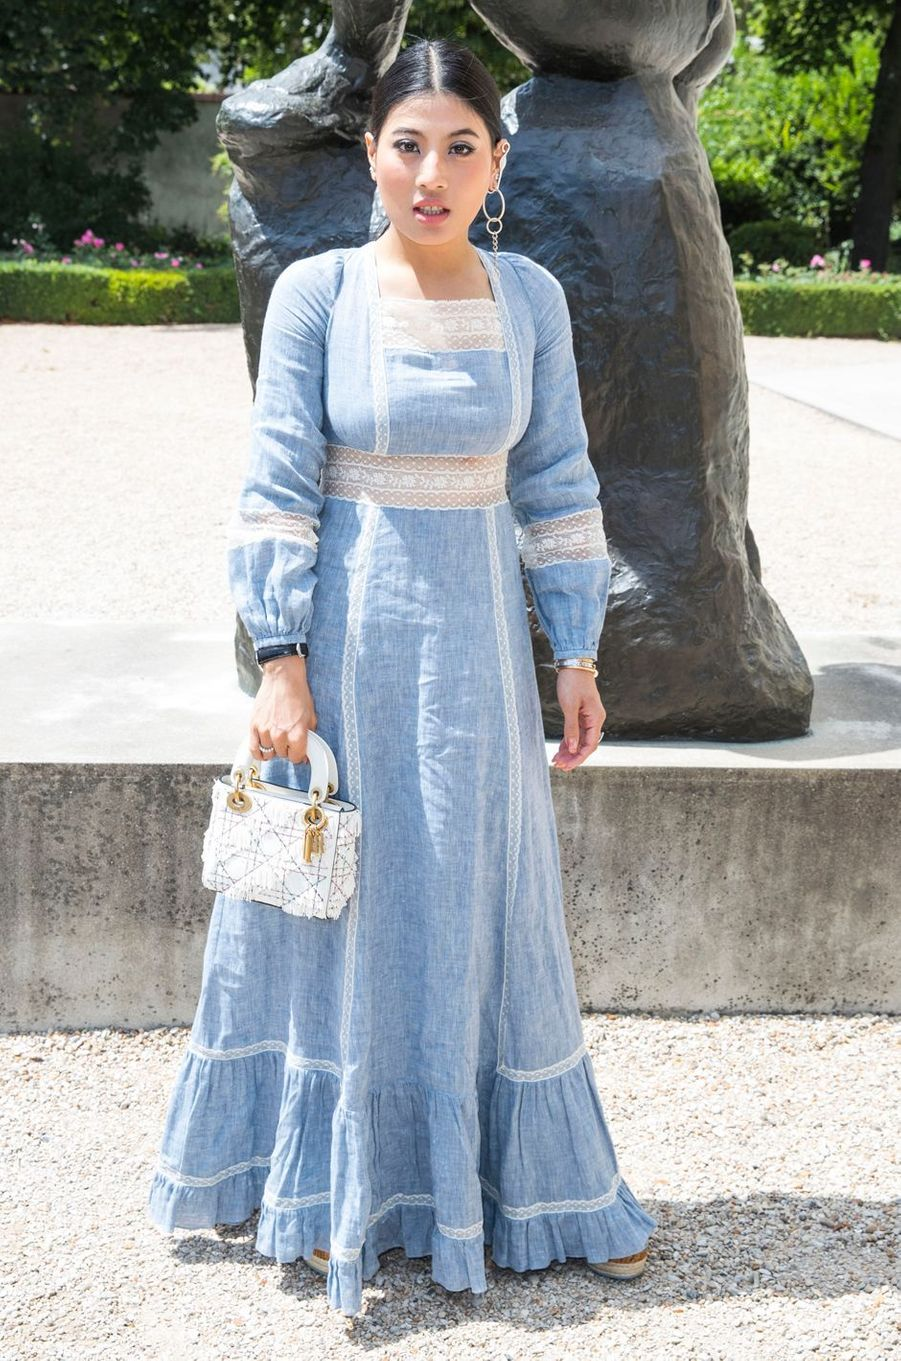 La princesse Sirivannavari Nariratana de Thaïlande au défilé Christian Dior à Paris, le 2 juillet 2018